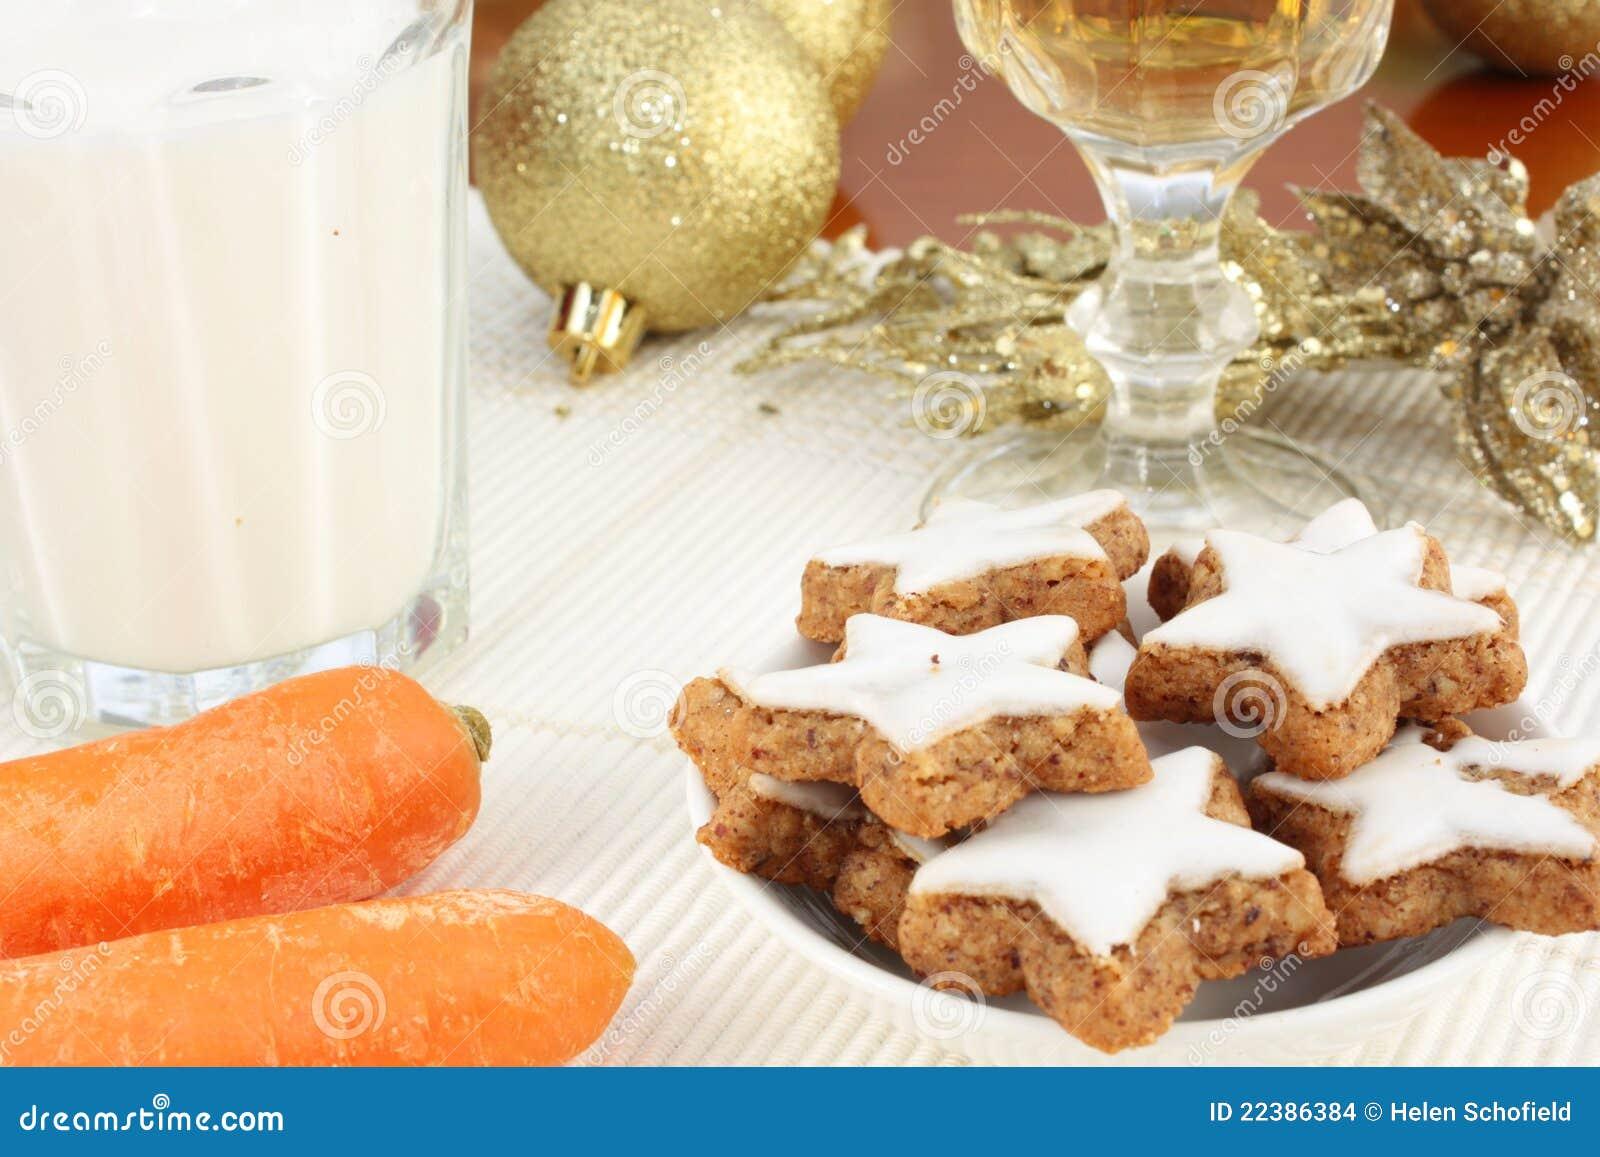 snacks for santa claus and rudolf - Christmas Eve Snacks